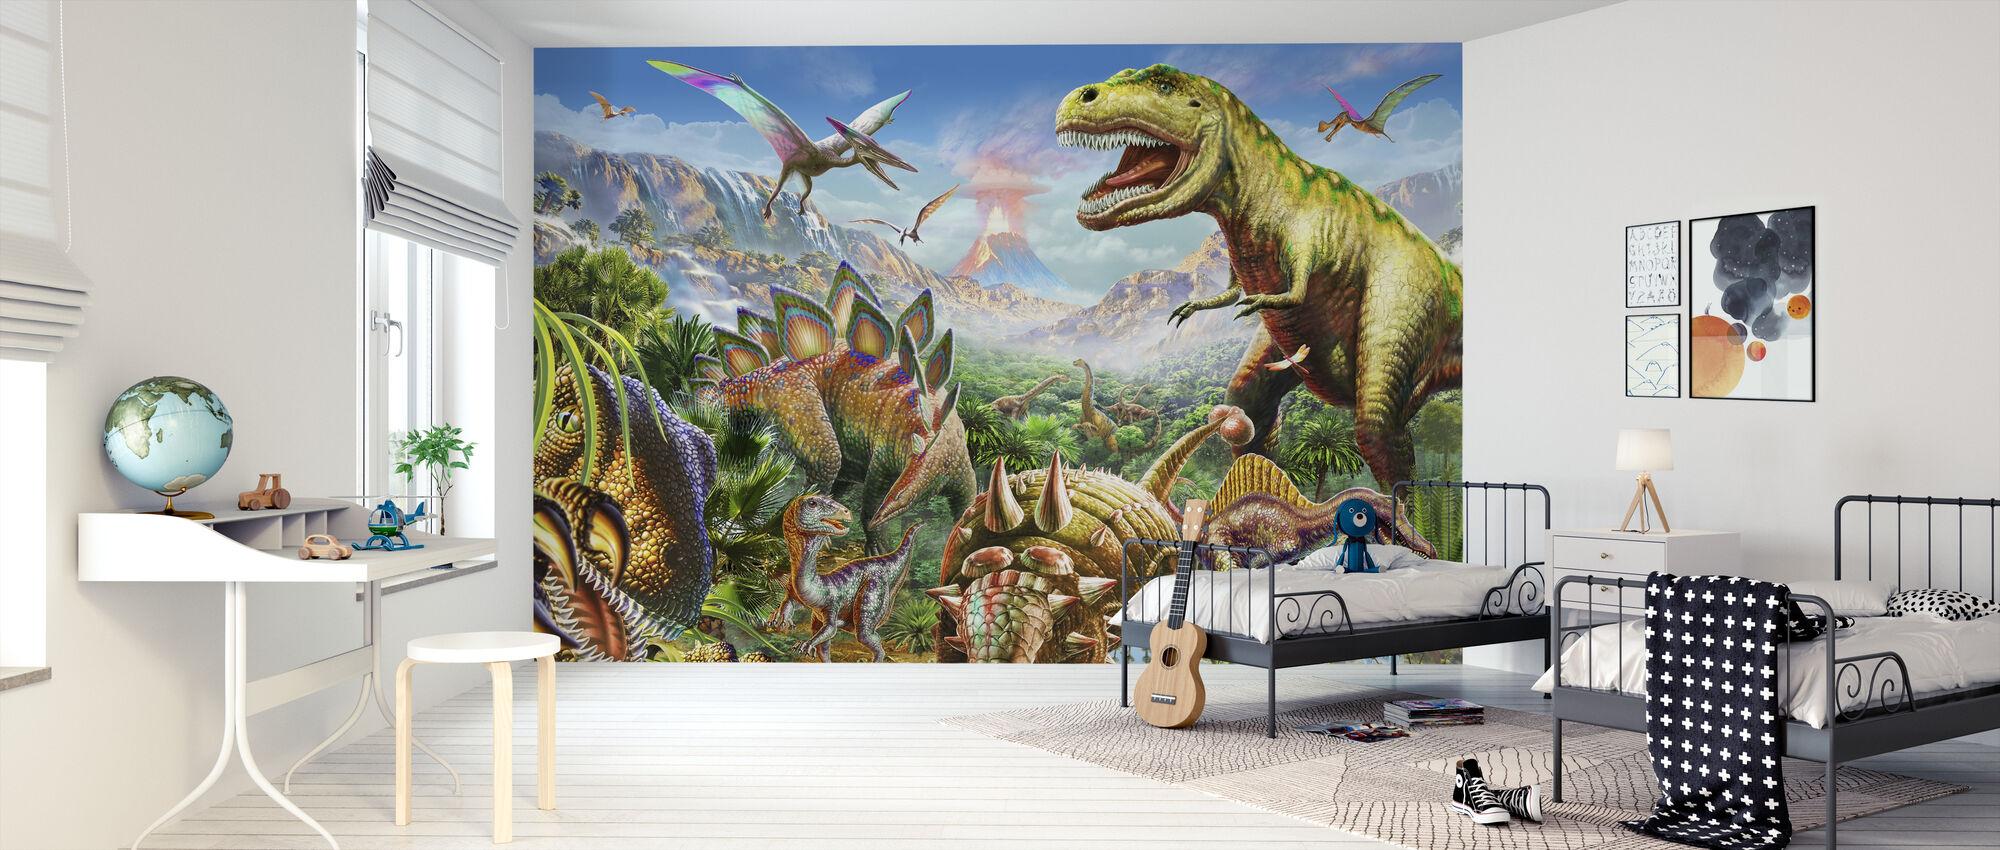 Grupo Dino - Papel pintado - Cuarto de niños